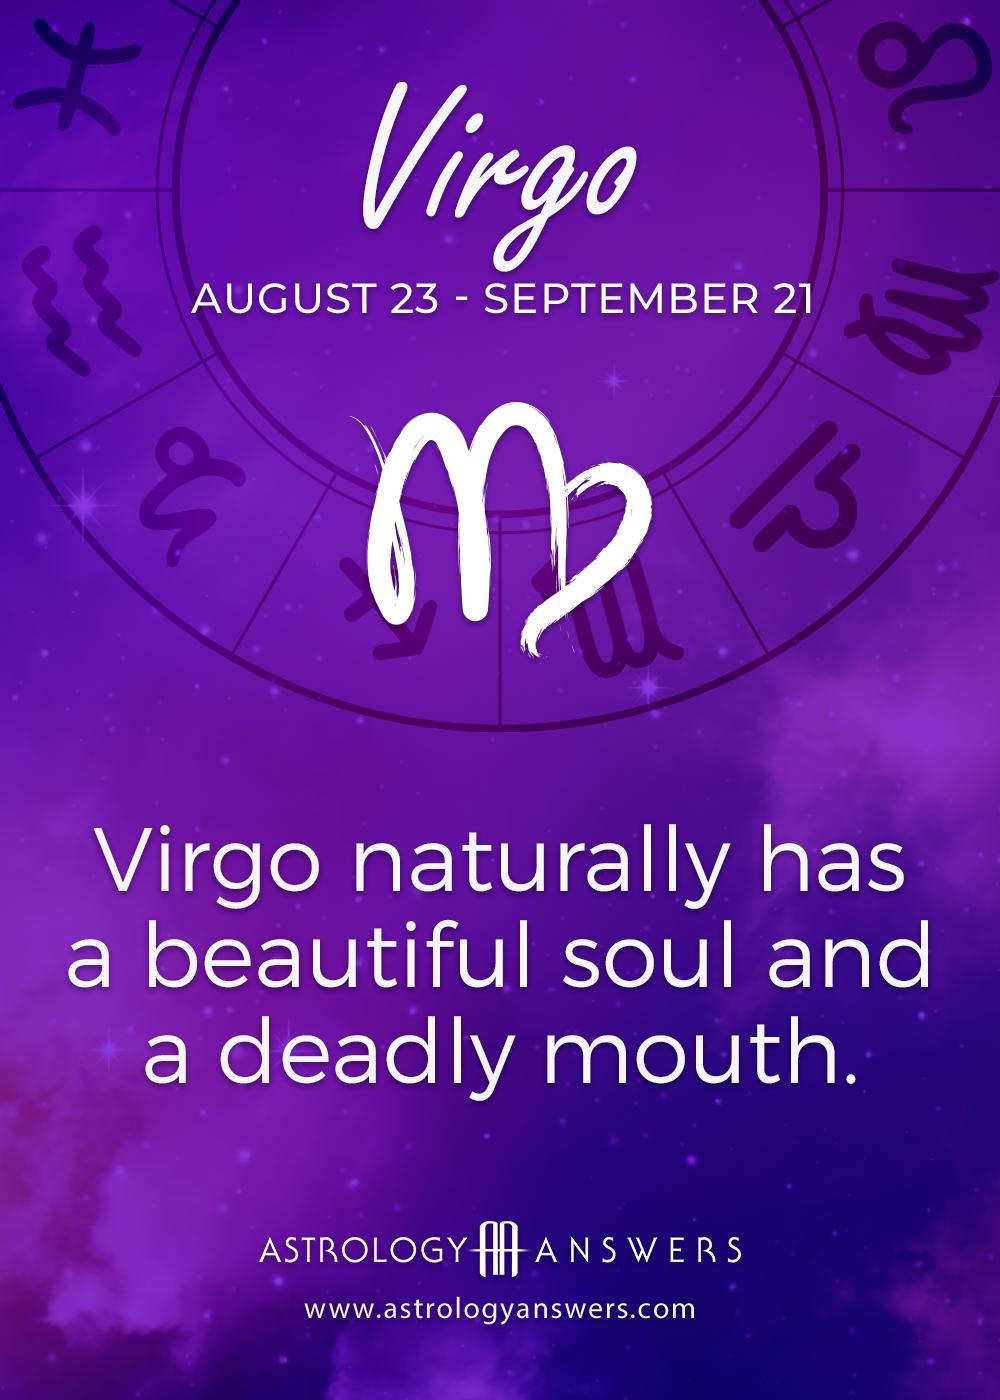 Virgo daily horoscope 2021